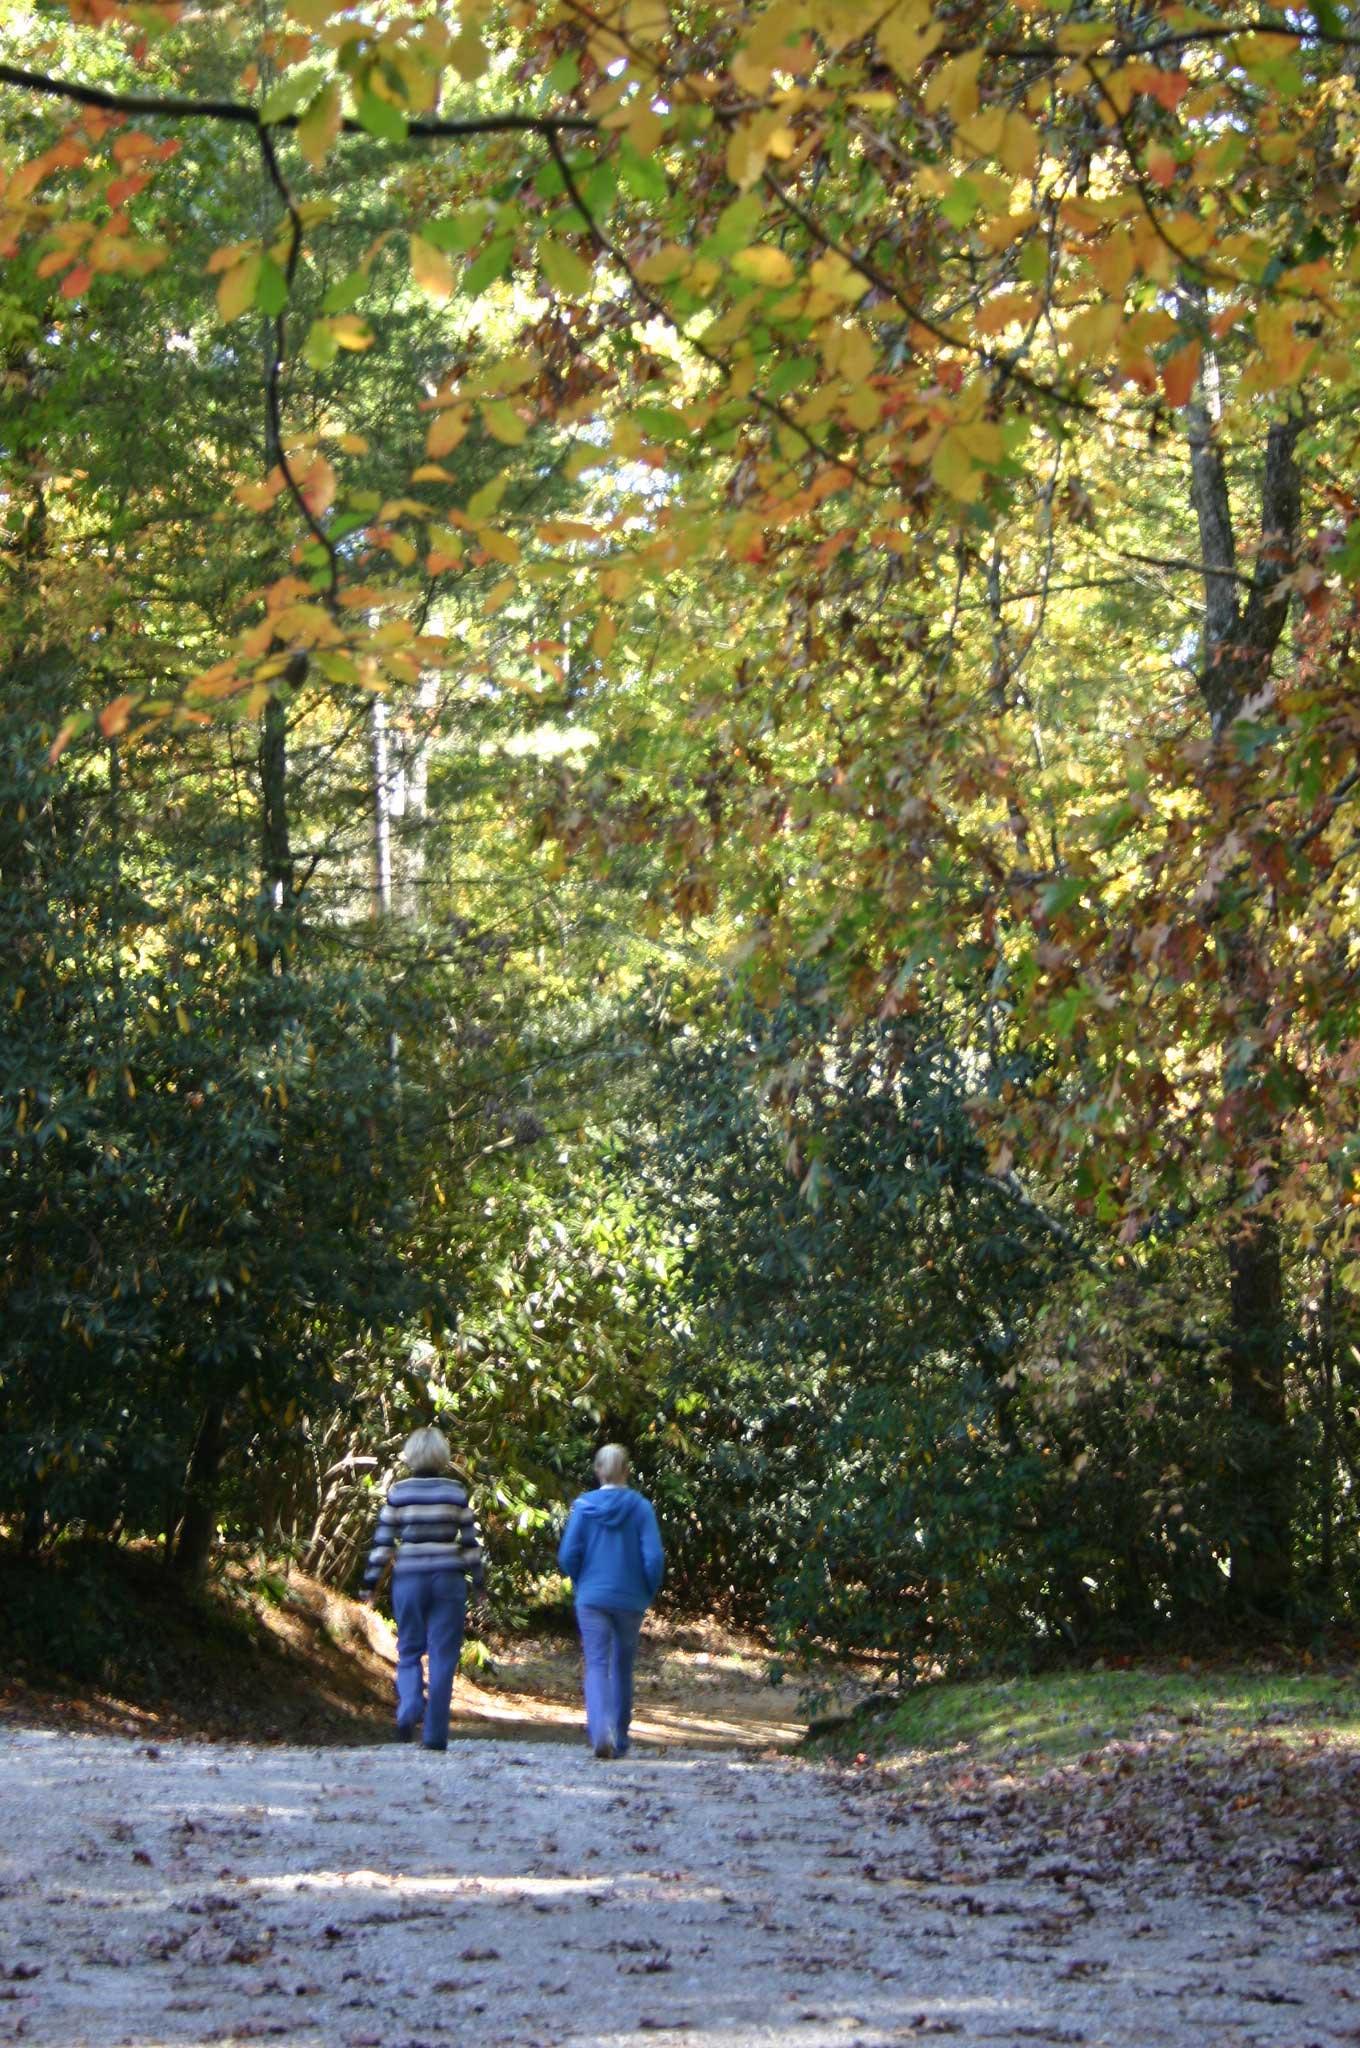 North Carolina Mountain Resort Takes Fall Foliage to New